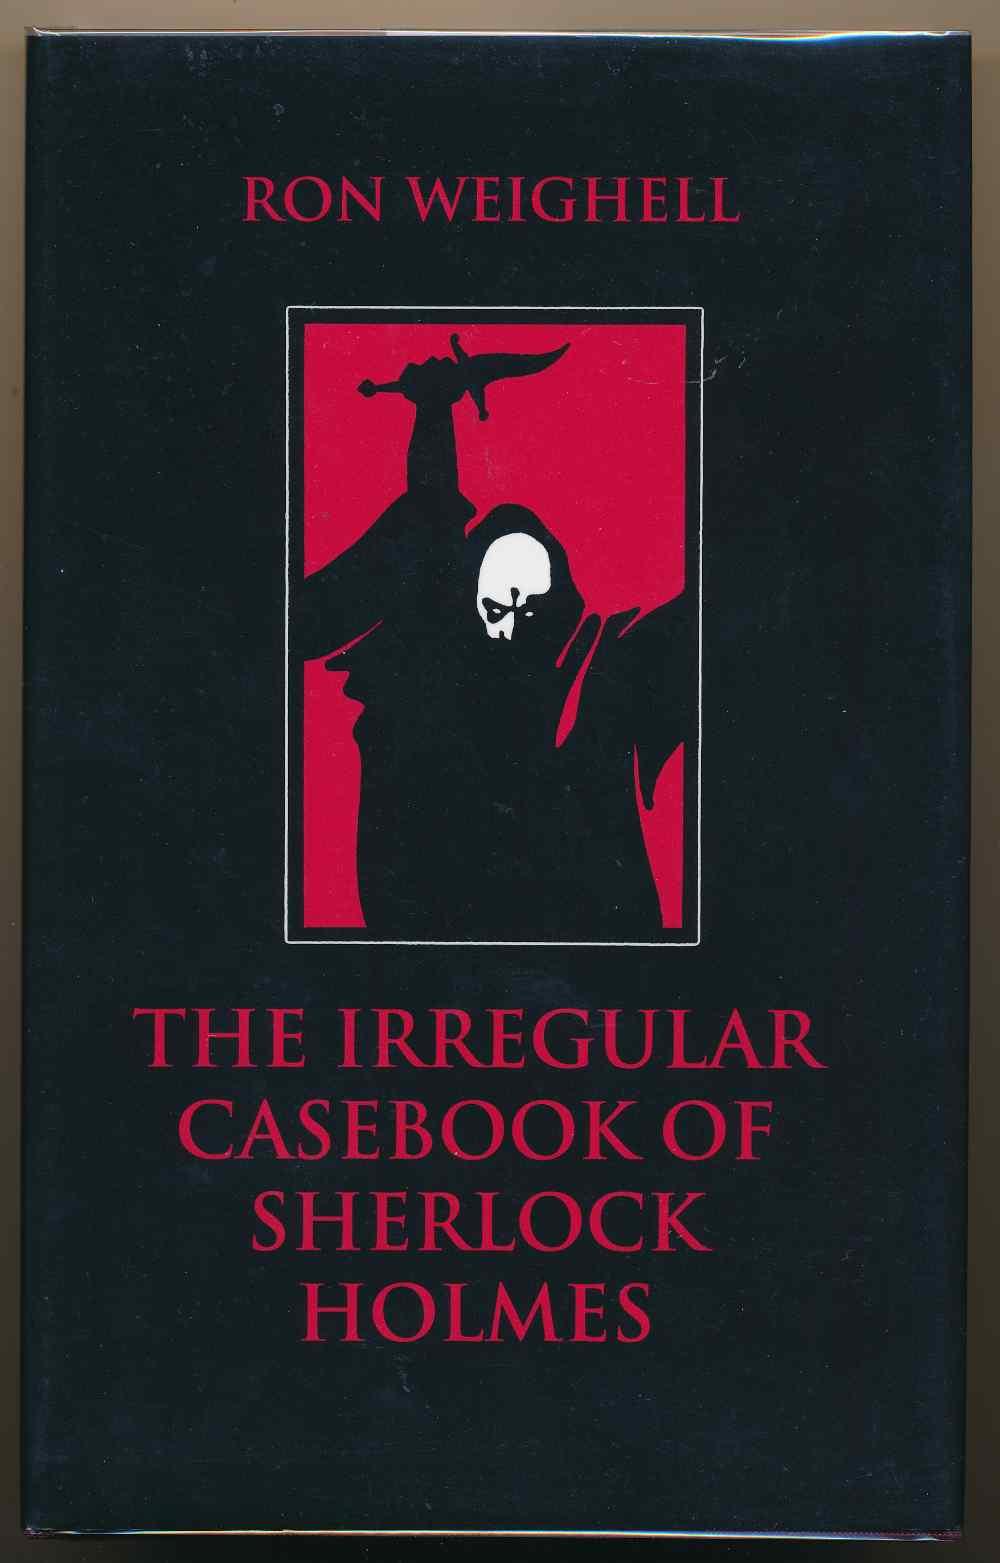 The irregular casebook of Sherlock Holmes